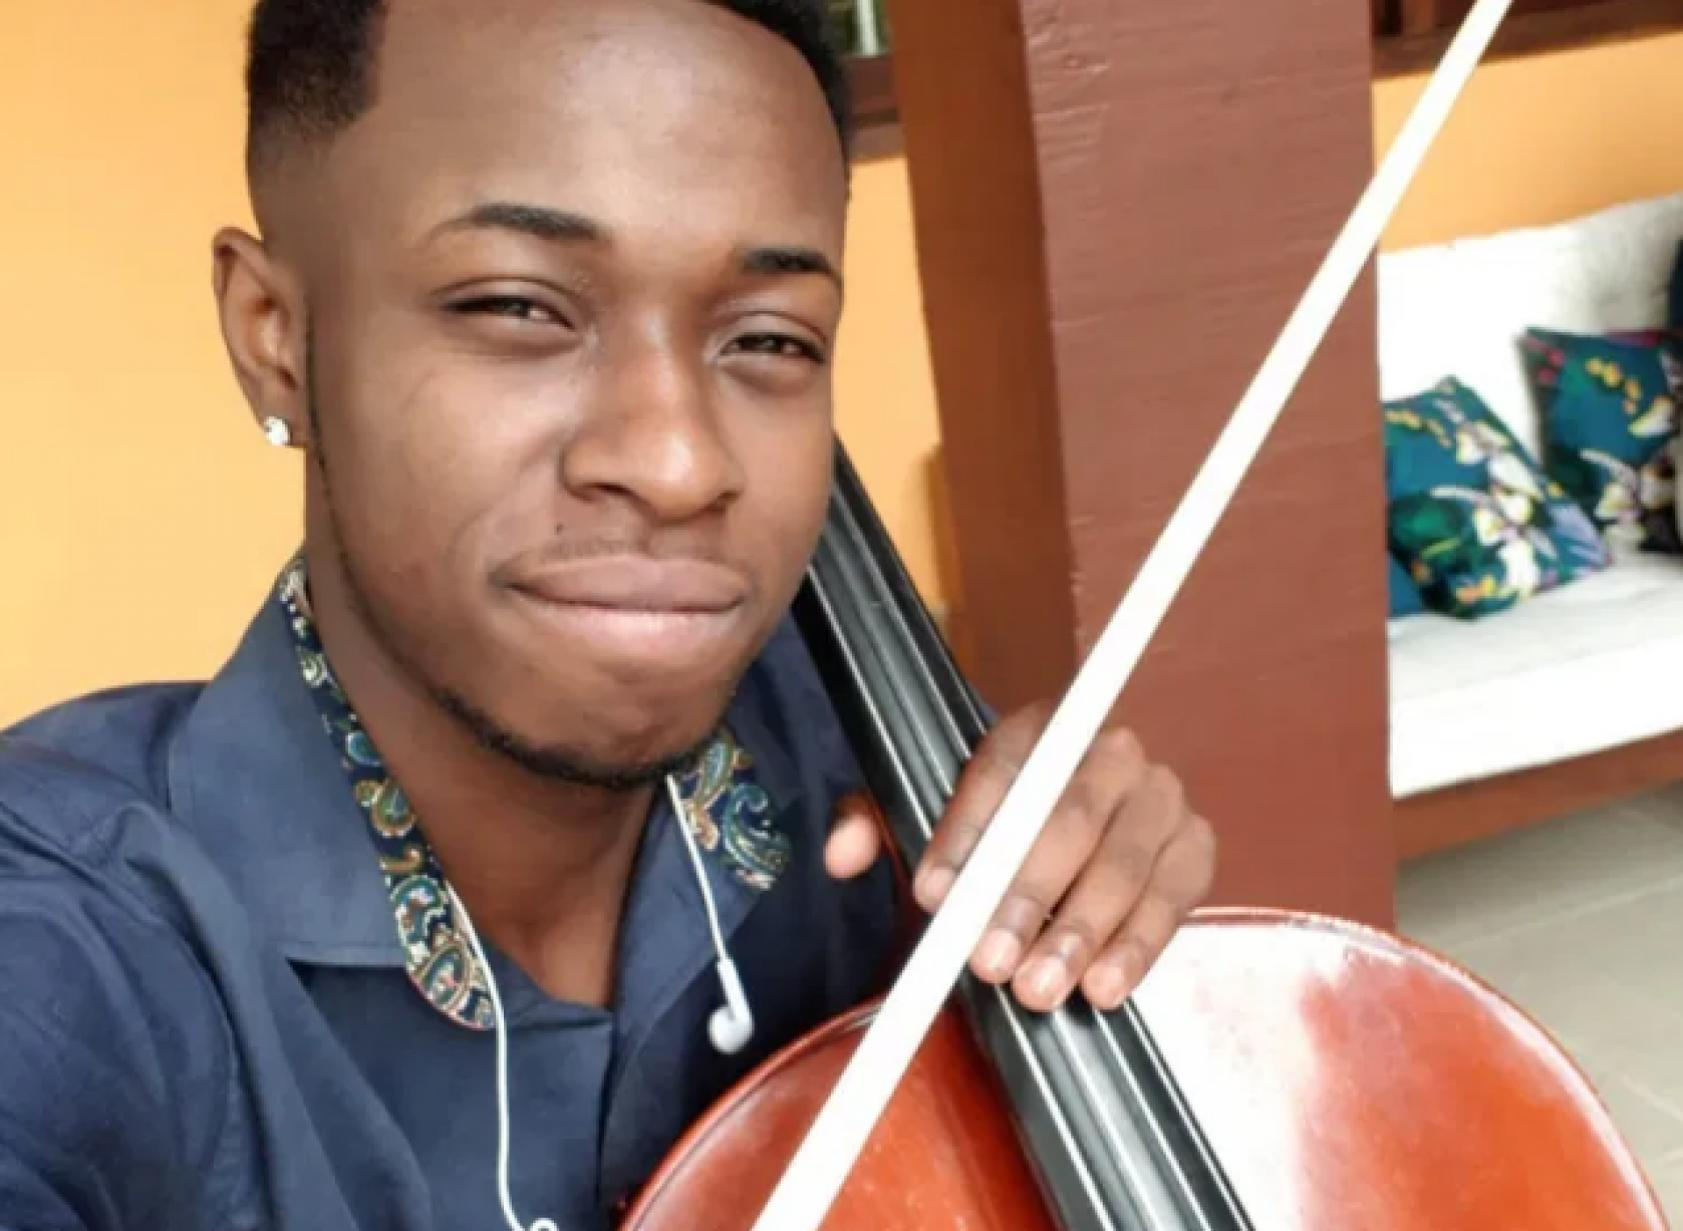 Luiz Carlos Justino: violonista preso por ter a foto num álbum de suspeitos. Foto do acervo pessoal